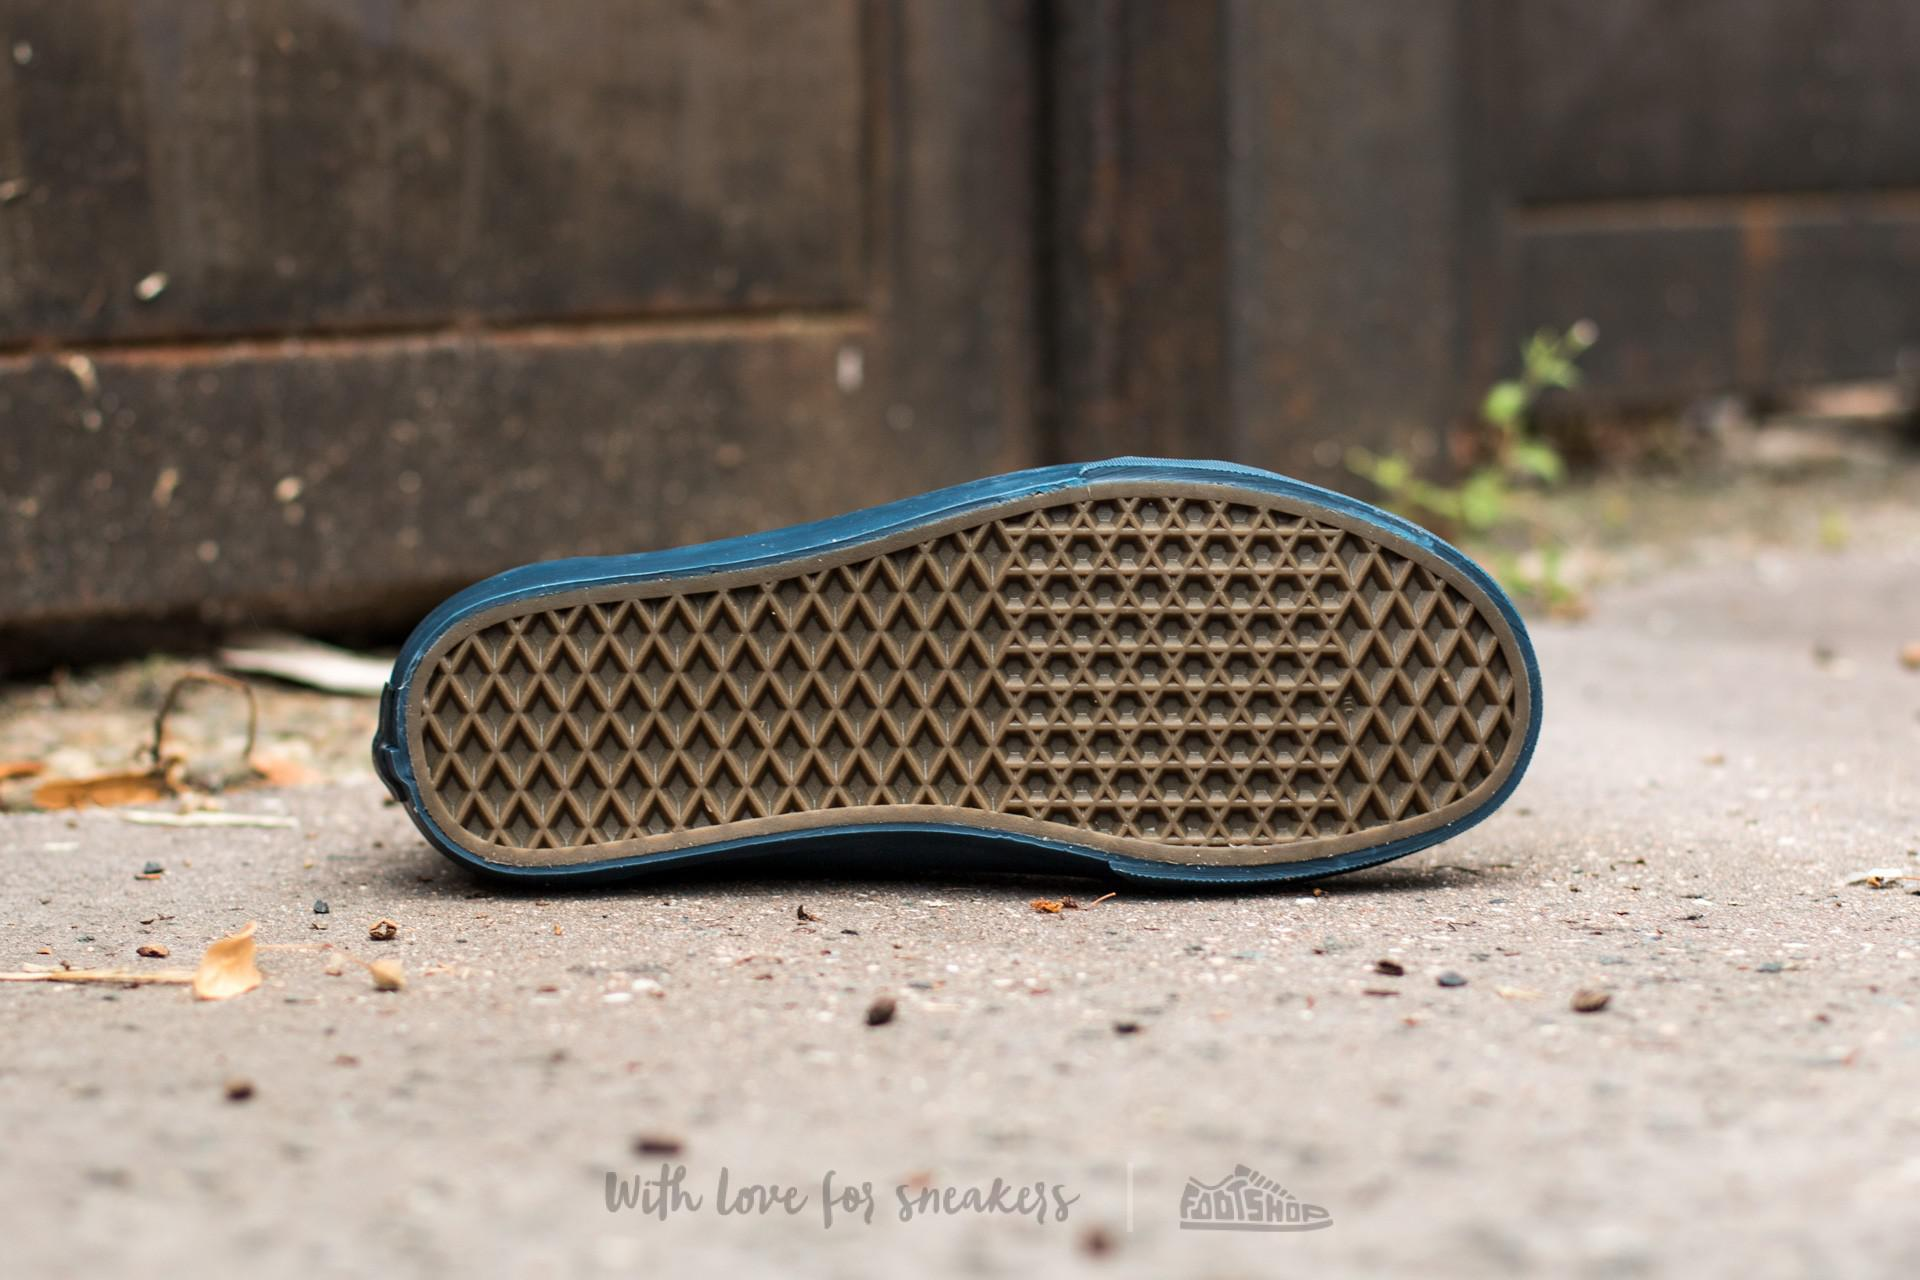 6c4ff1cc74 Lyst - Vans Old Skool Reissue (leather) Midnight Navy in Blue for Men